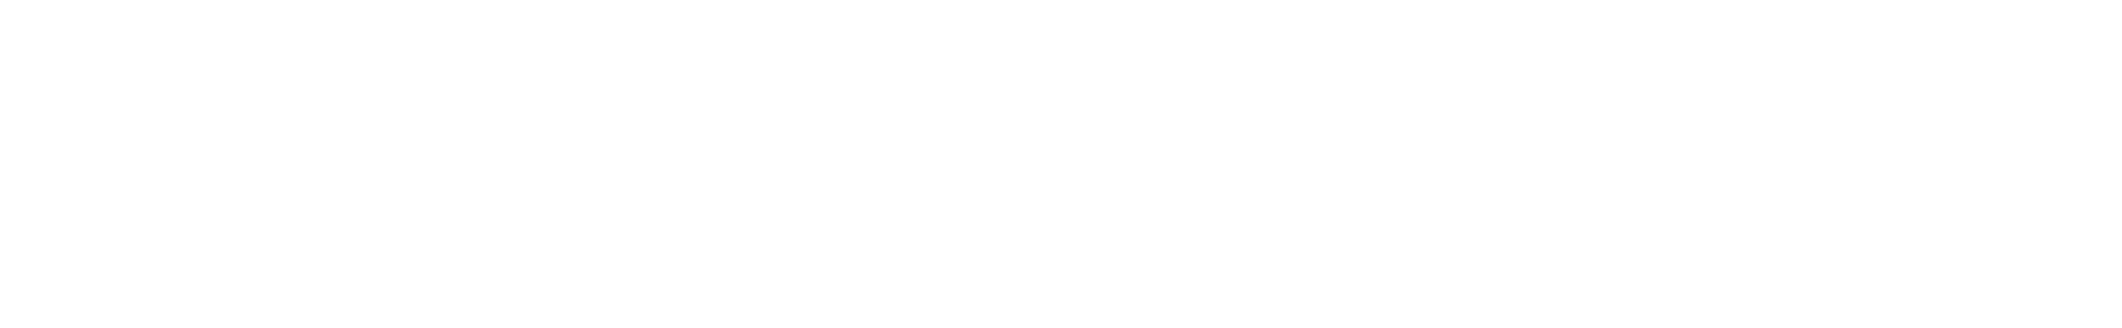 OceanX_Logomark_RGB_White